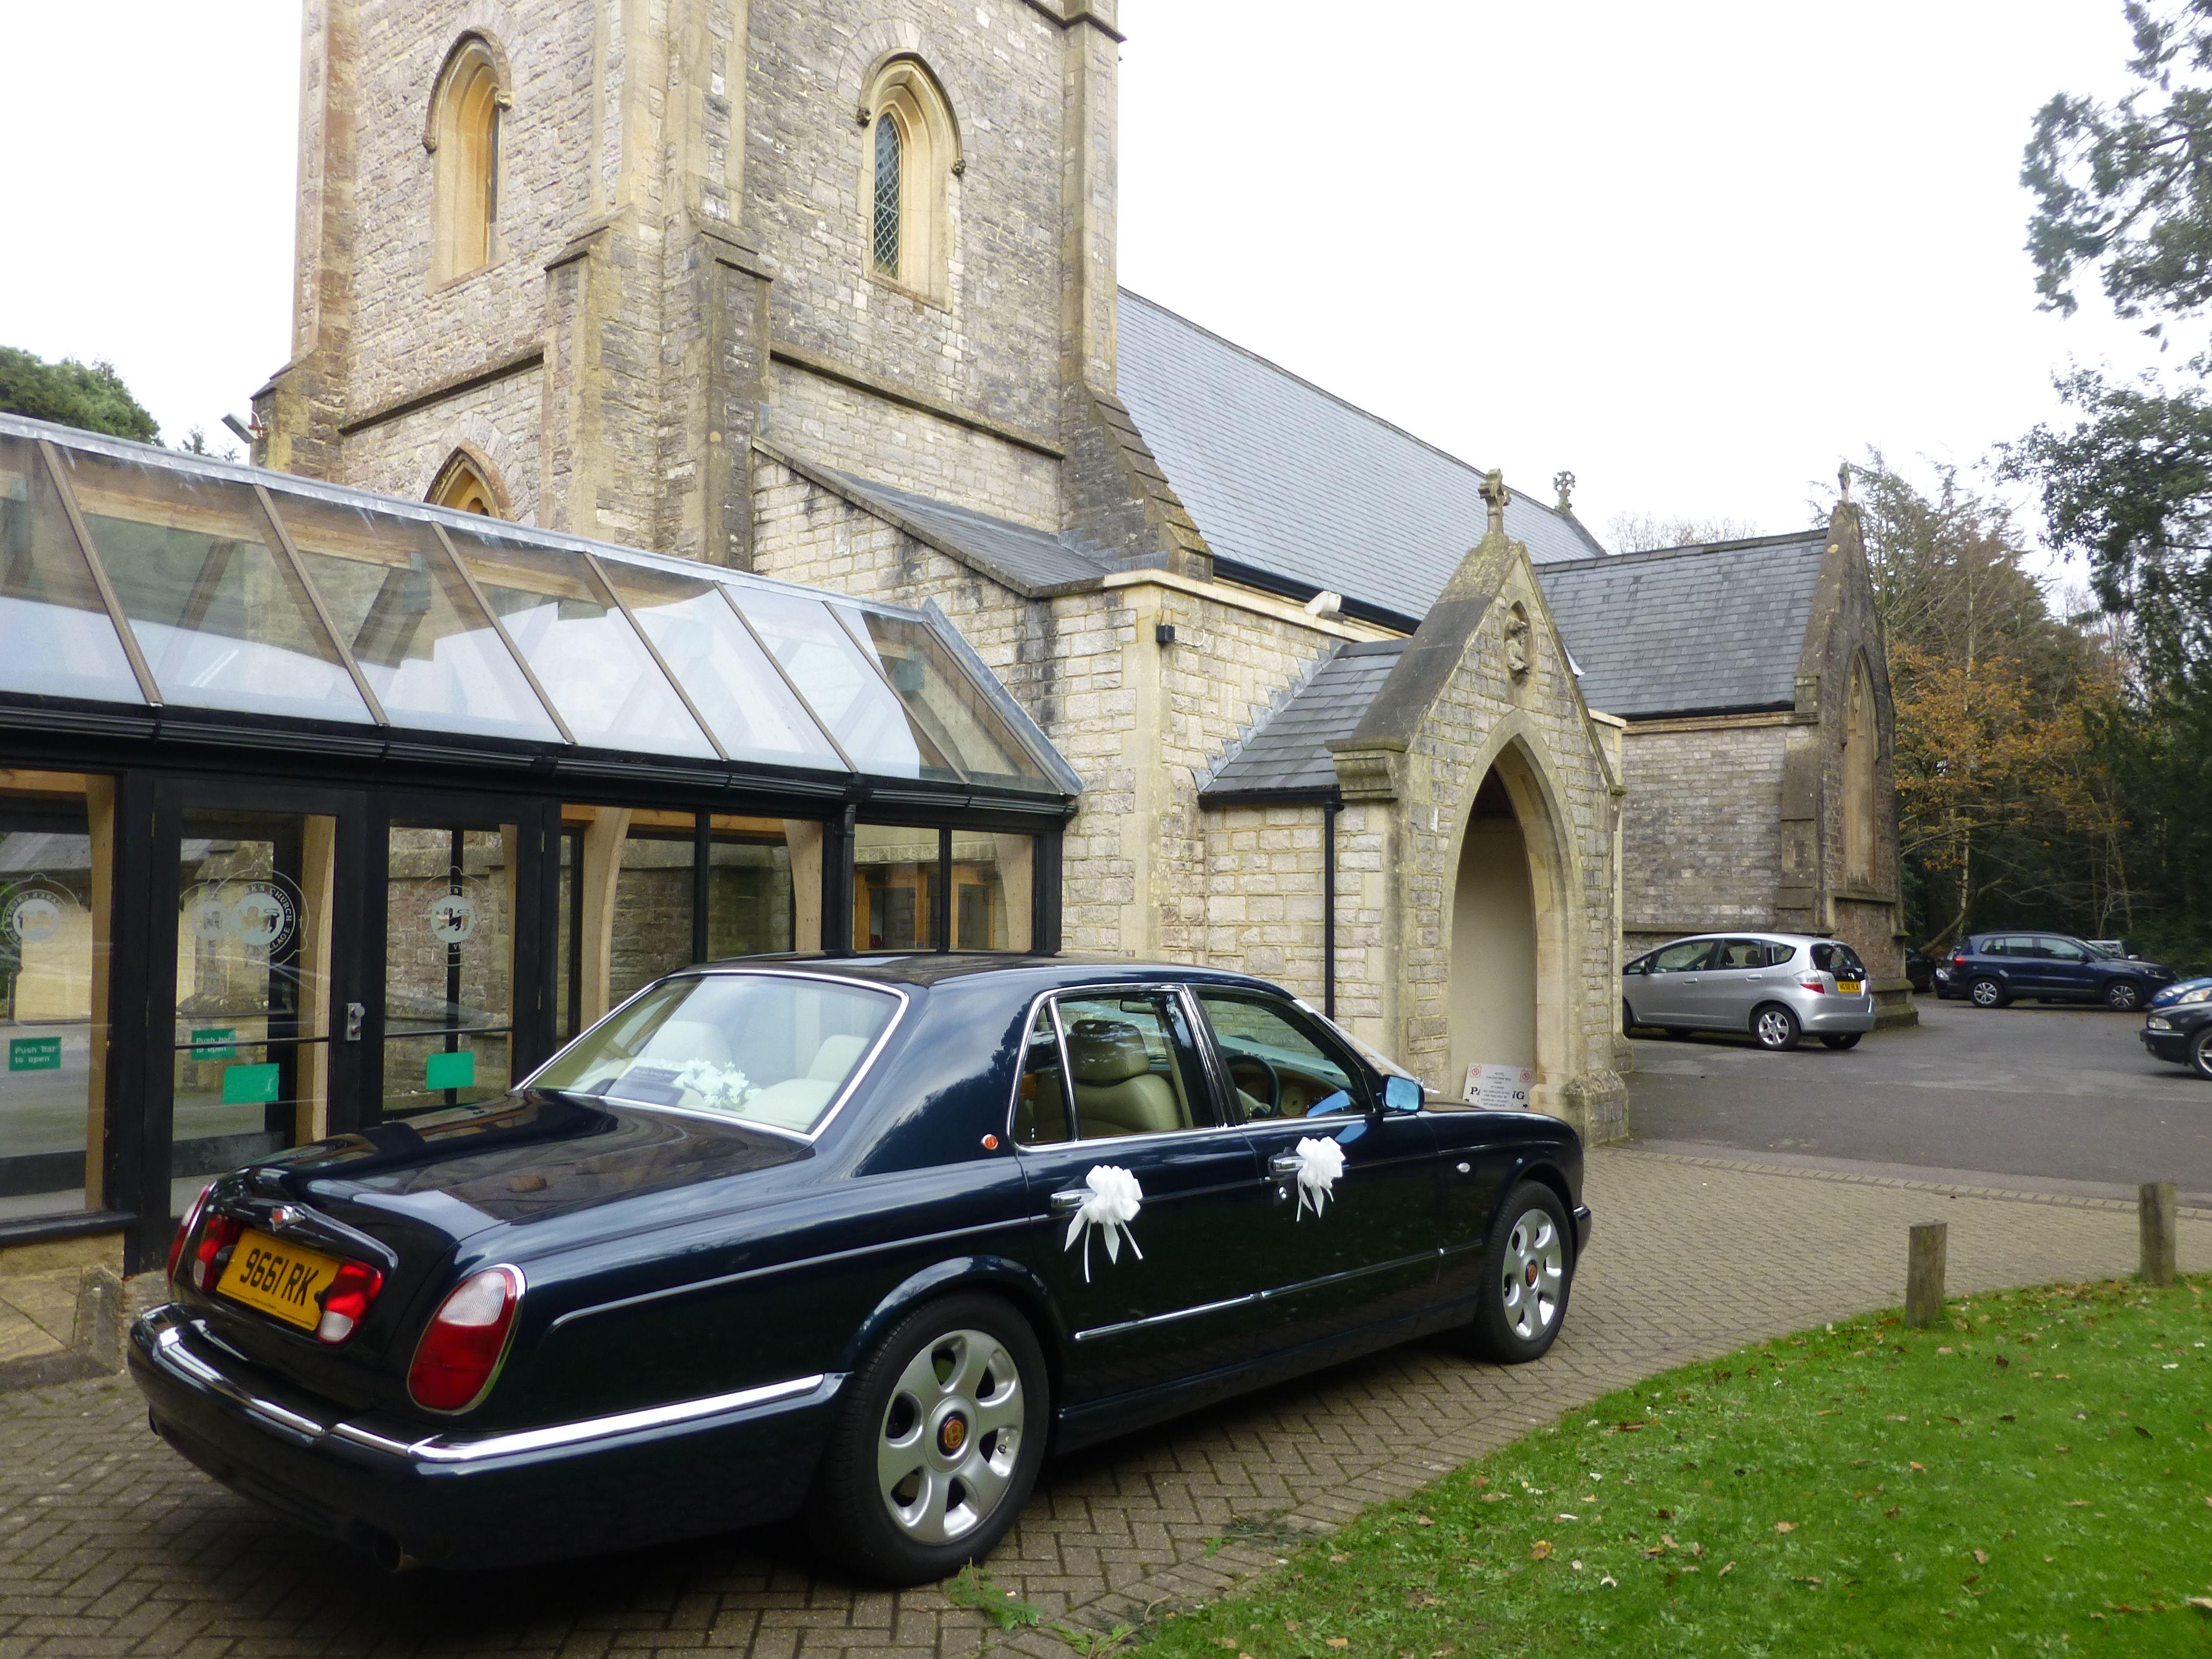 Bentley wedding car at St Mark's Church, Bournemouth ...